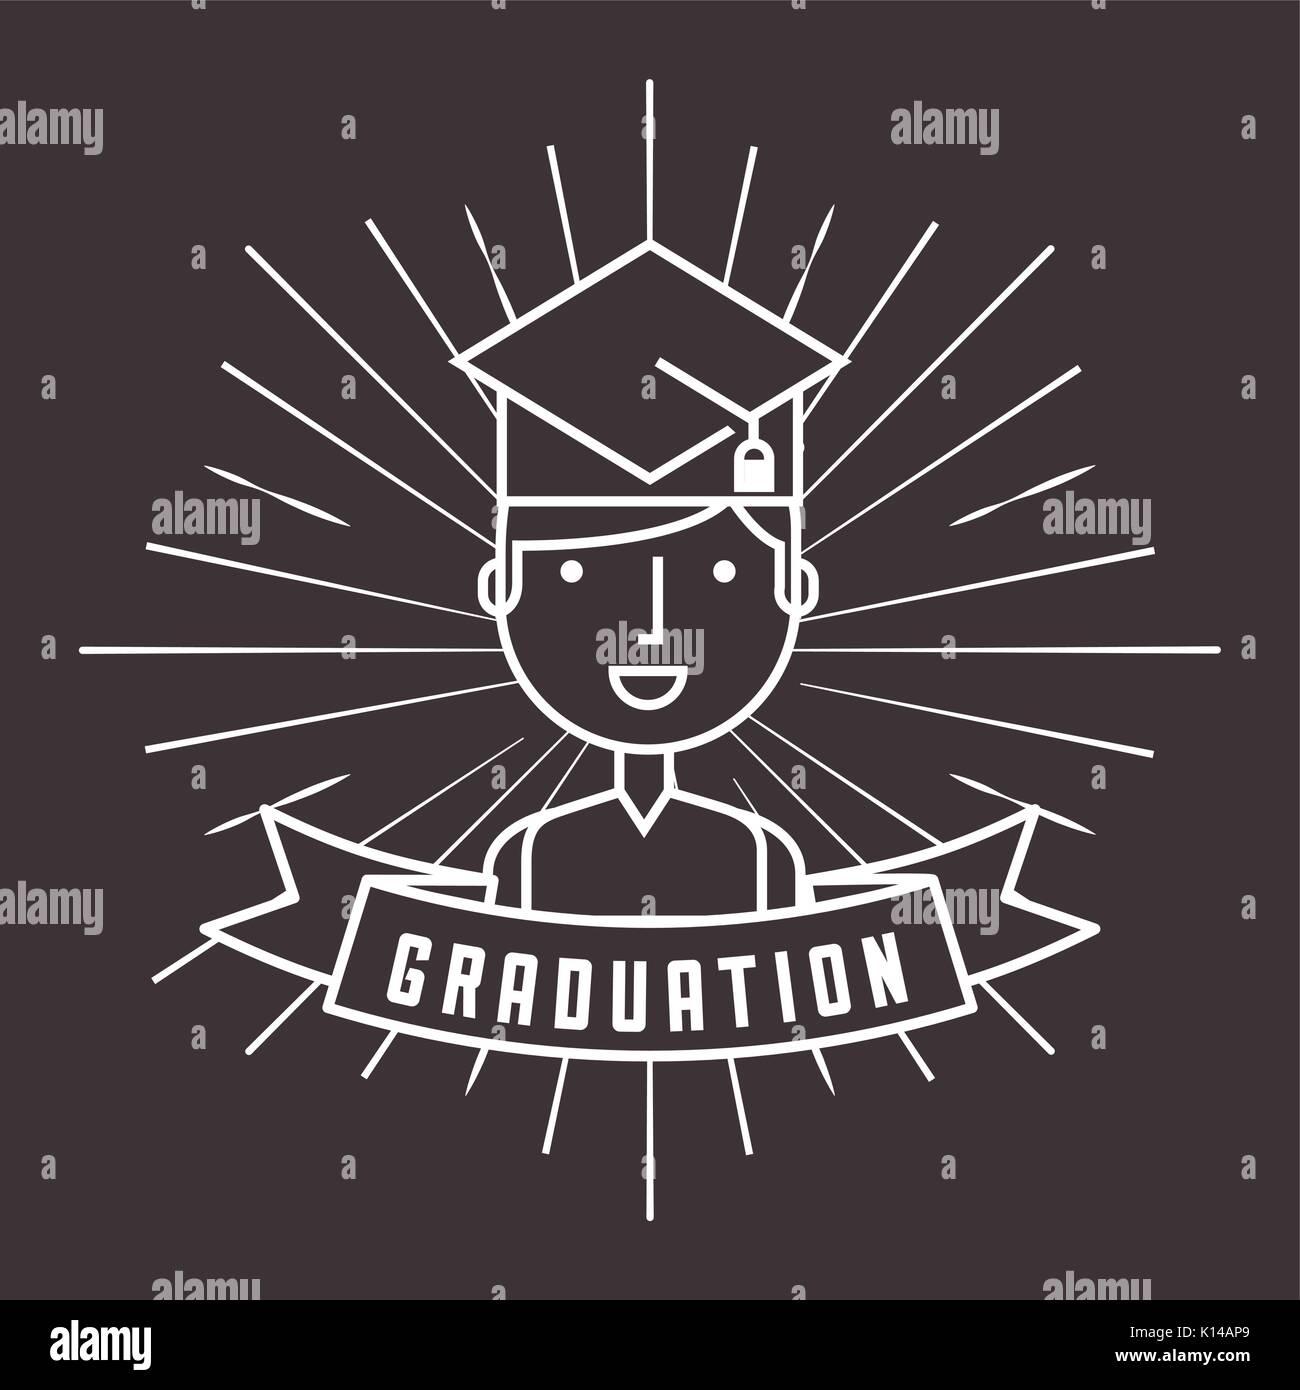 graduation celebration design  - Stock Image